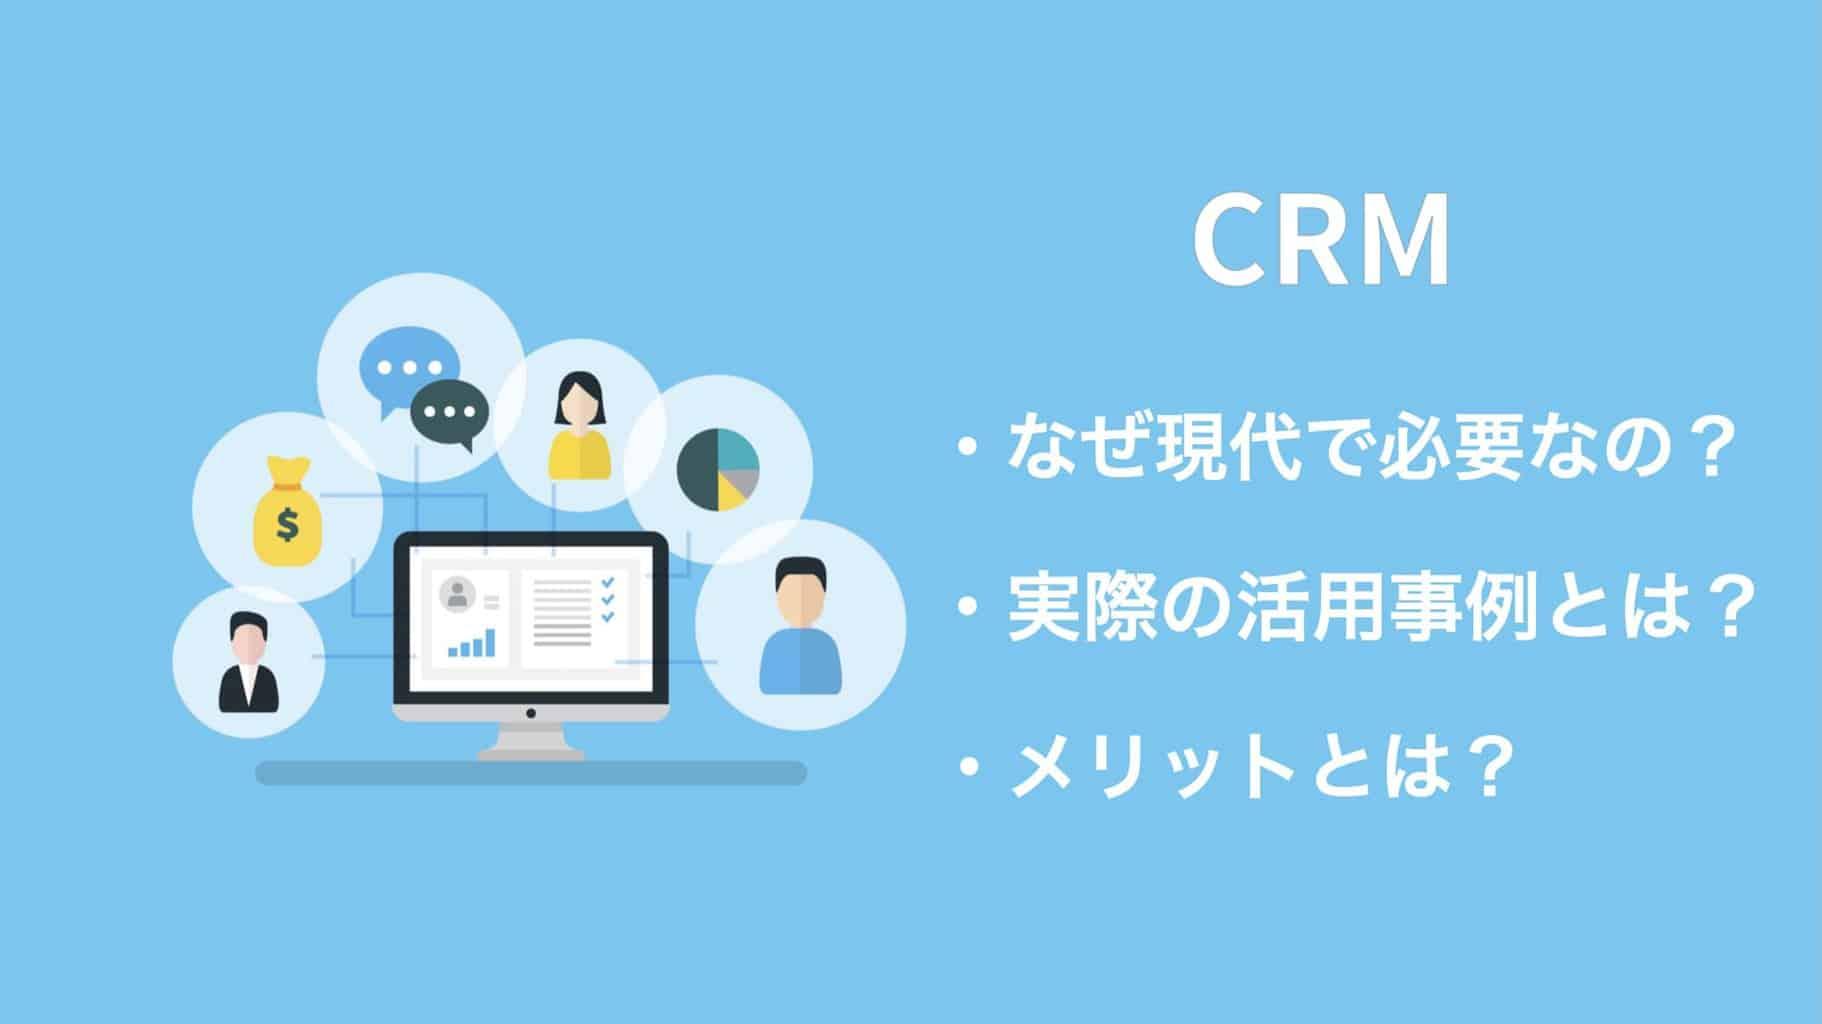 CRMのマーケティング事例とは?メリットも解説!